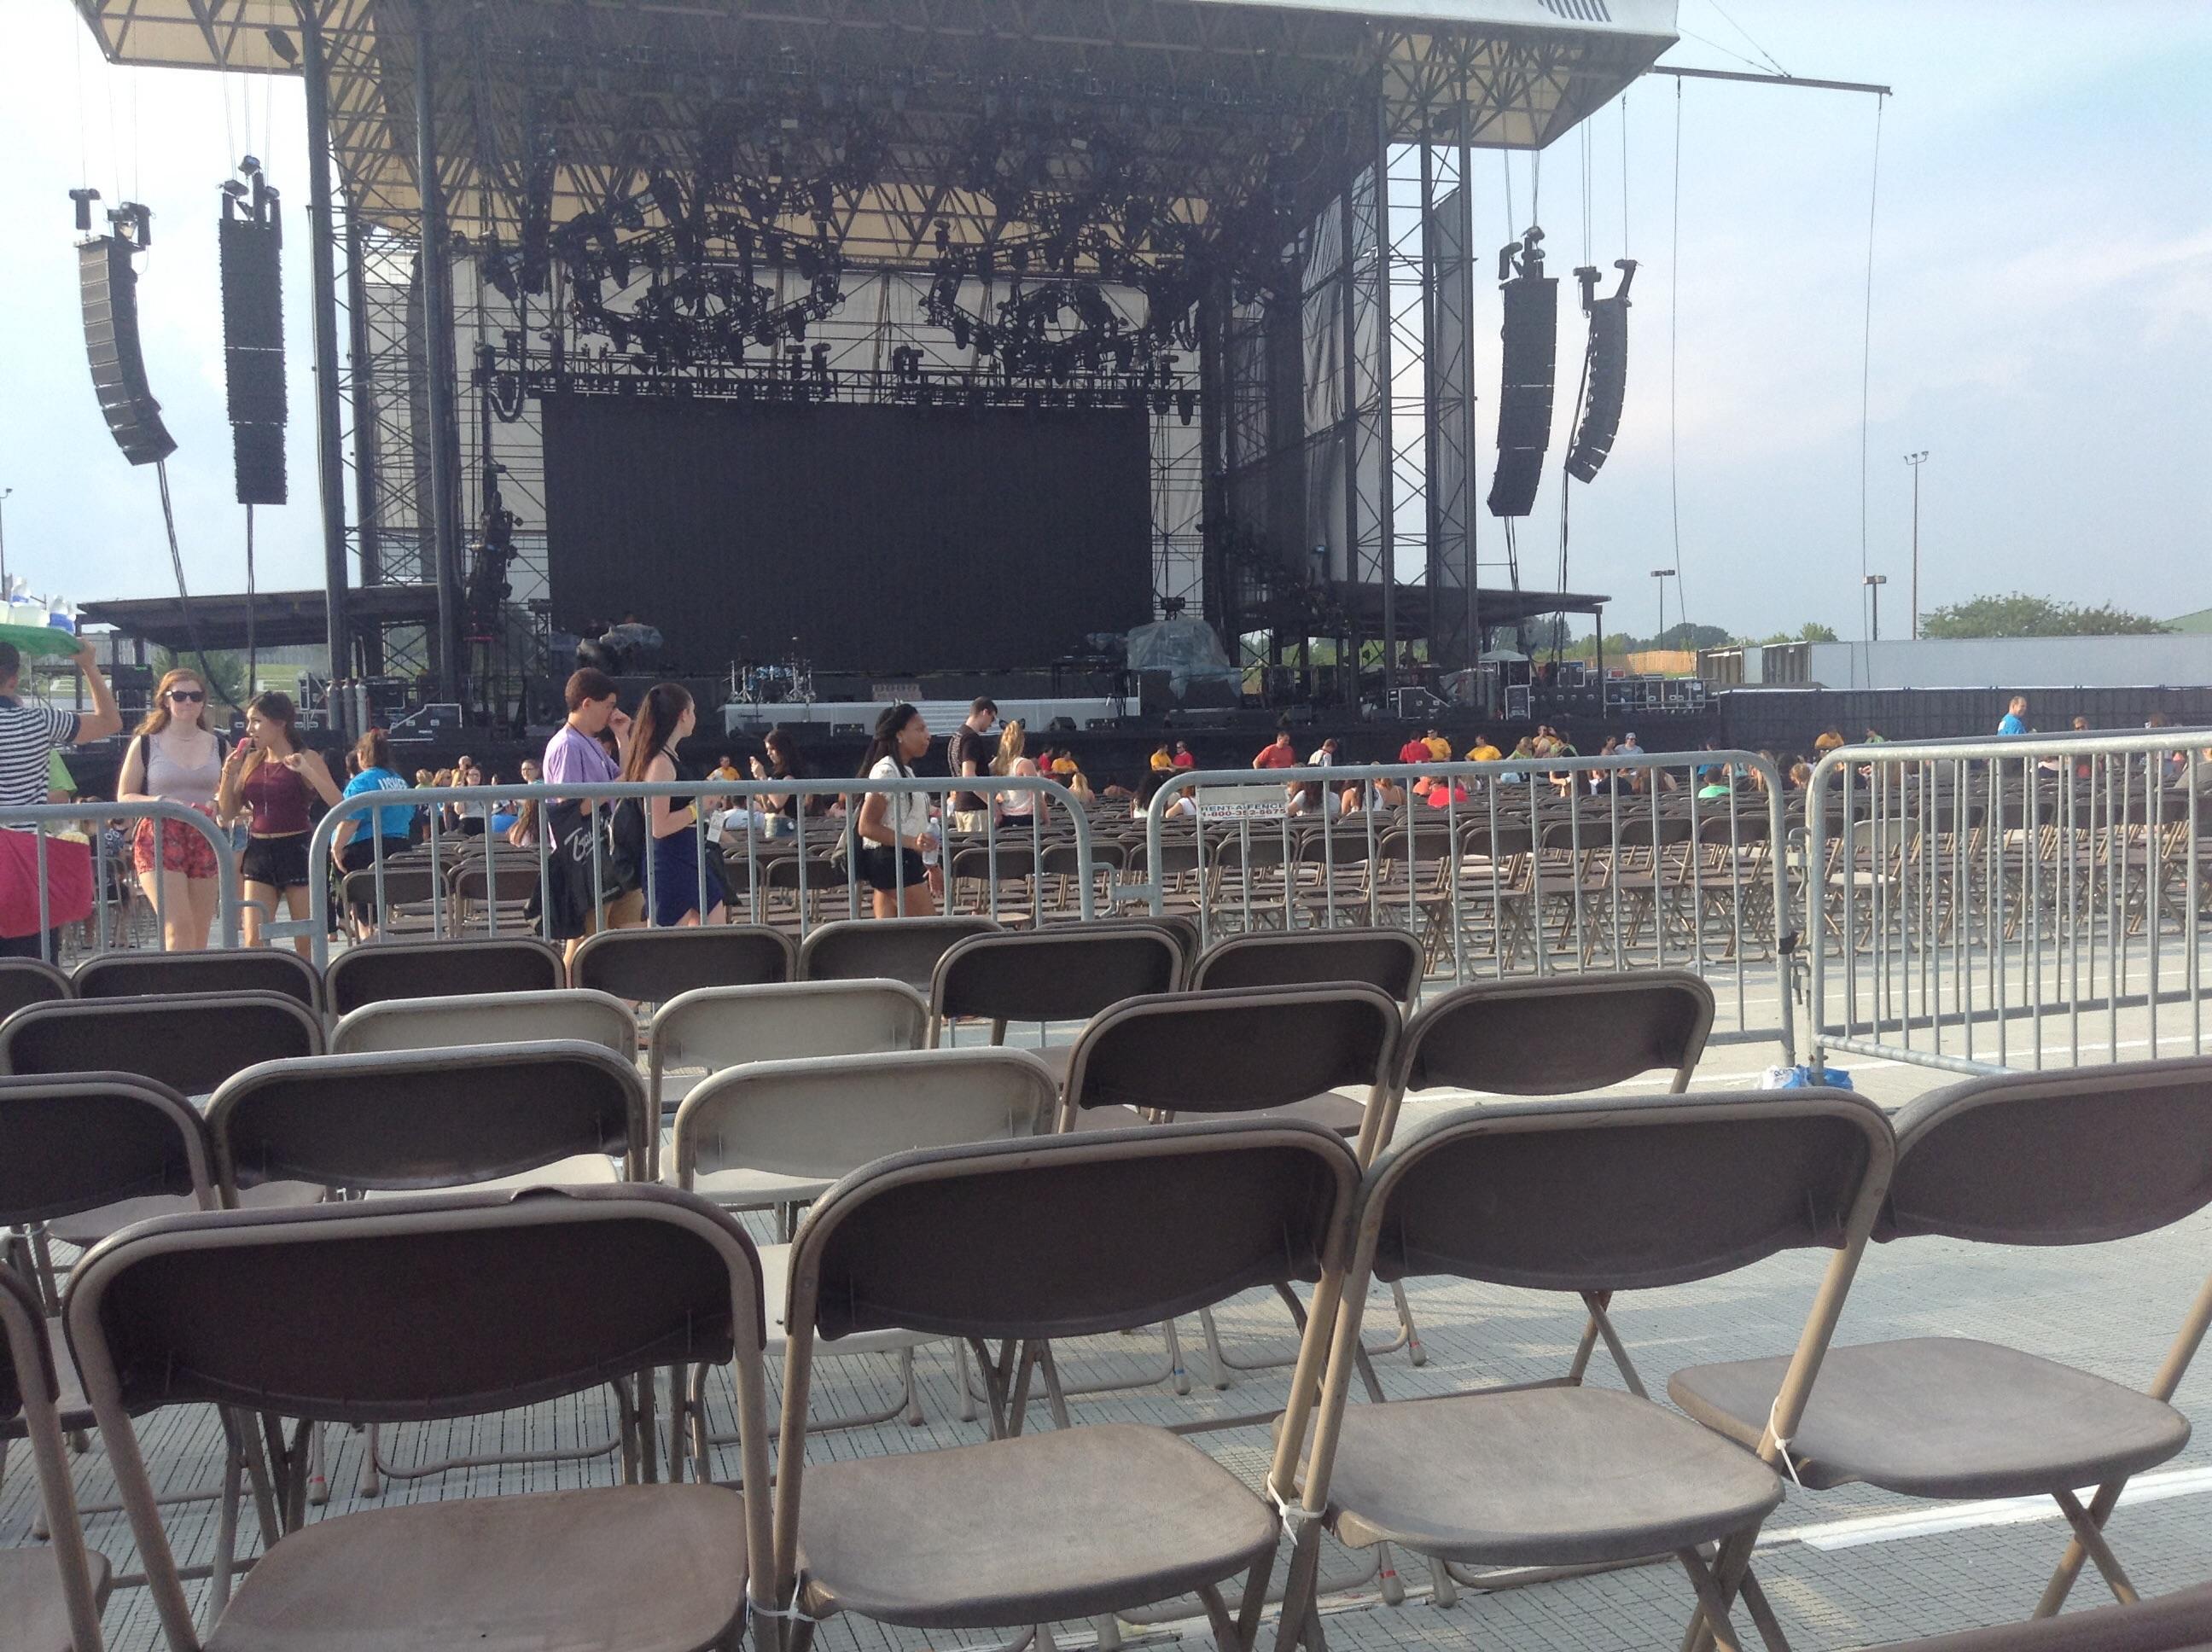 Hershey Park Stadium section E row 38 seat 5 Ariana Grande vs The Honeymoon Tour d Anonymously